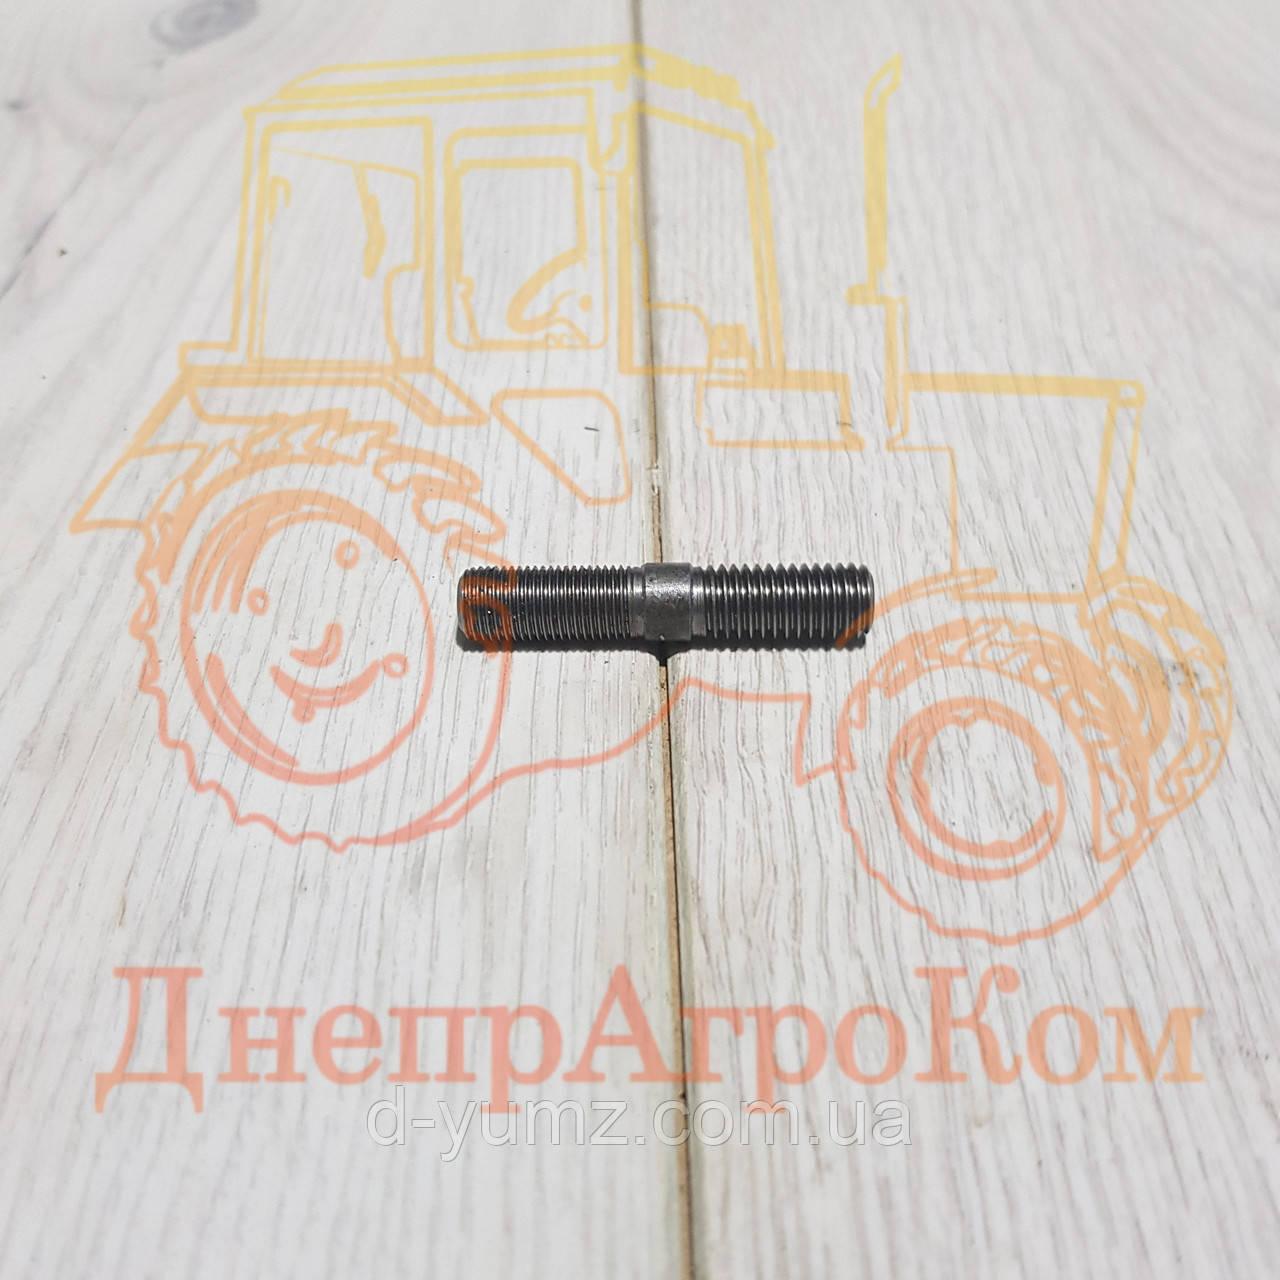 Шпилька крепления форсунки ЮМЗ Д-65 Д02-070